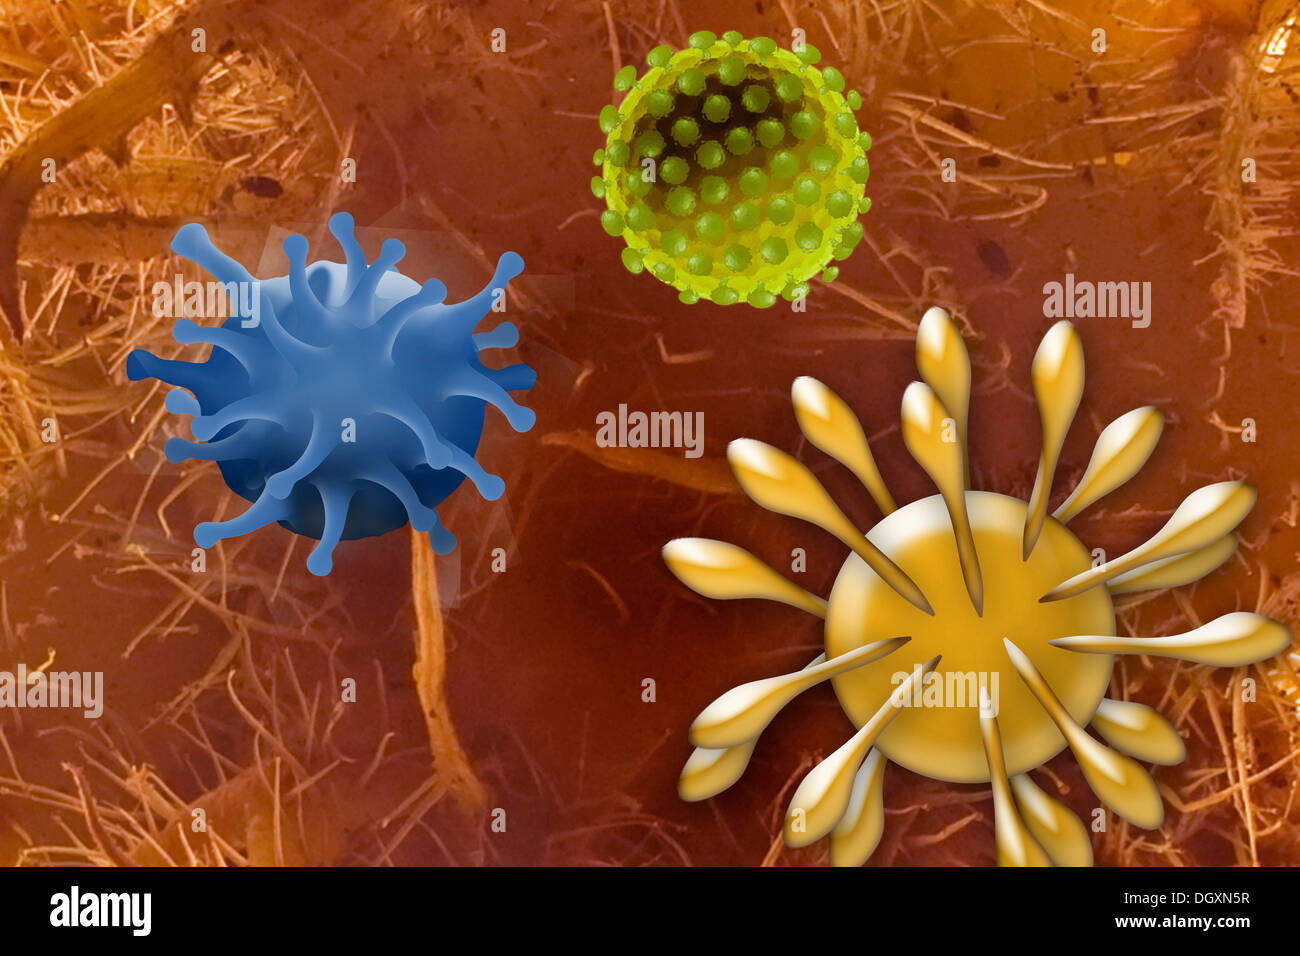 Viruses, illustration - Stock Image